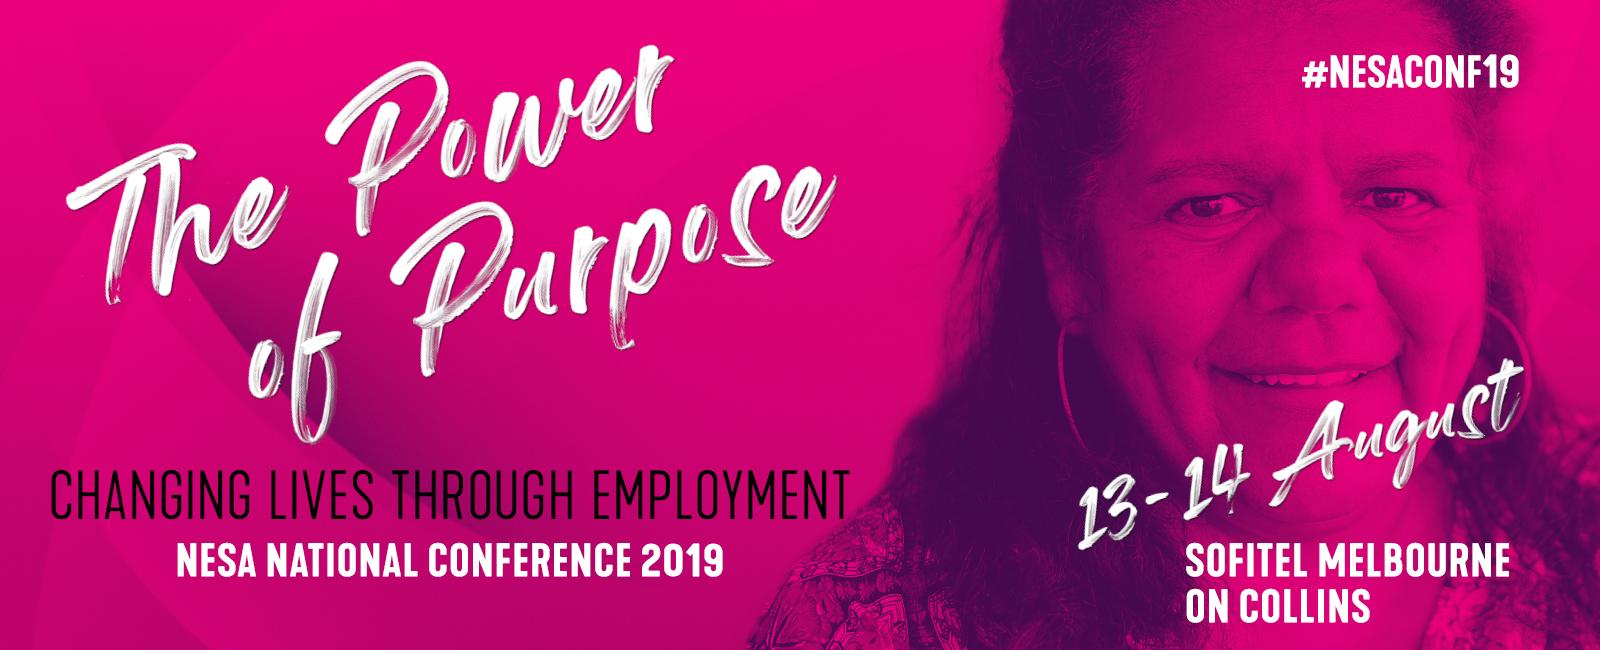 NESA Conference 2019 Banner